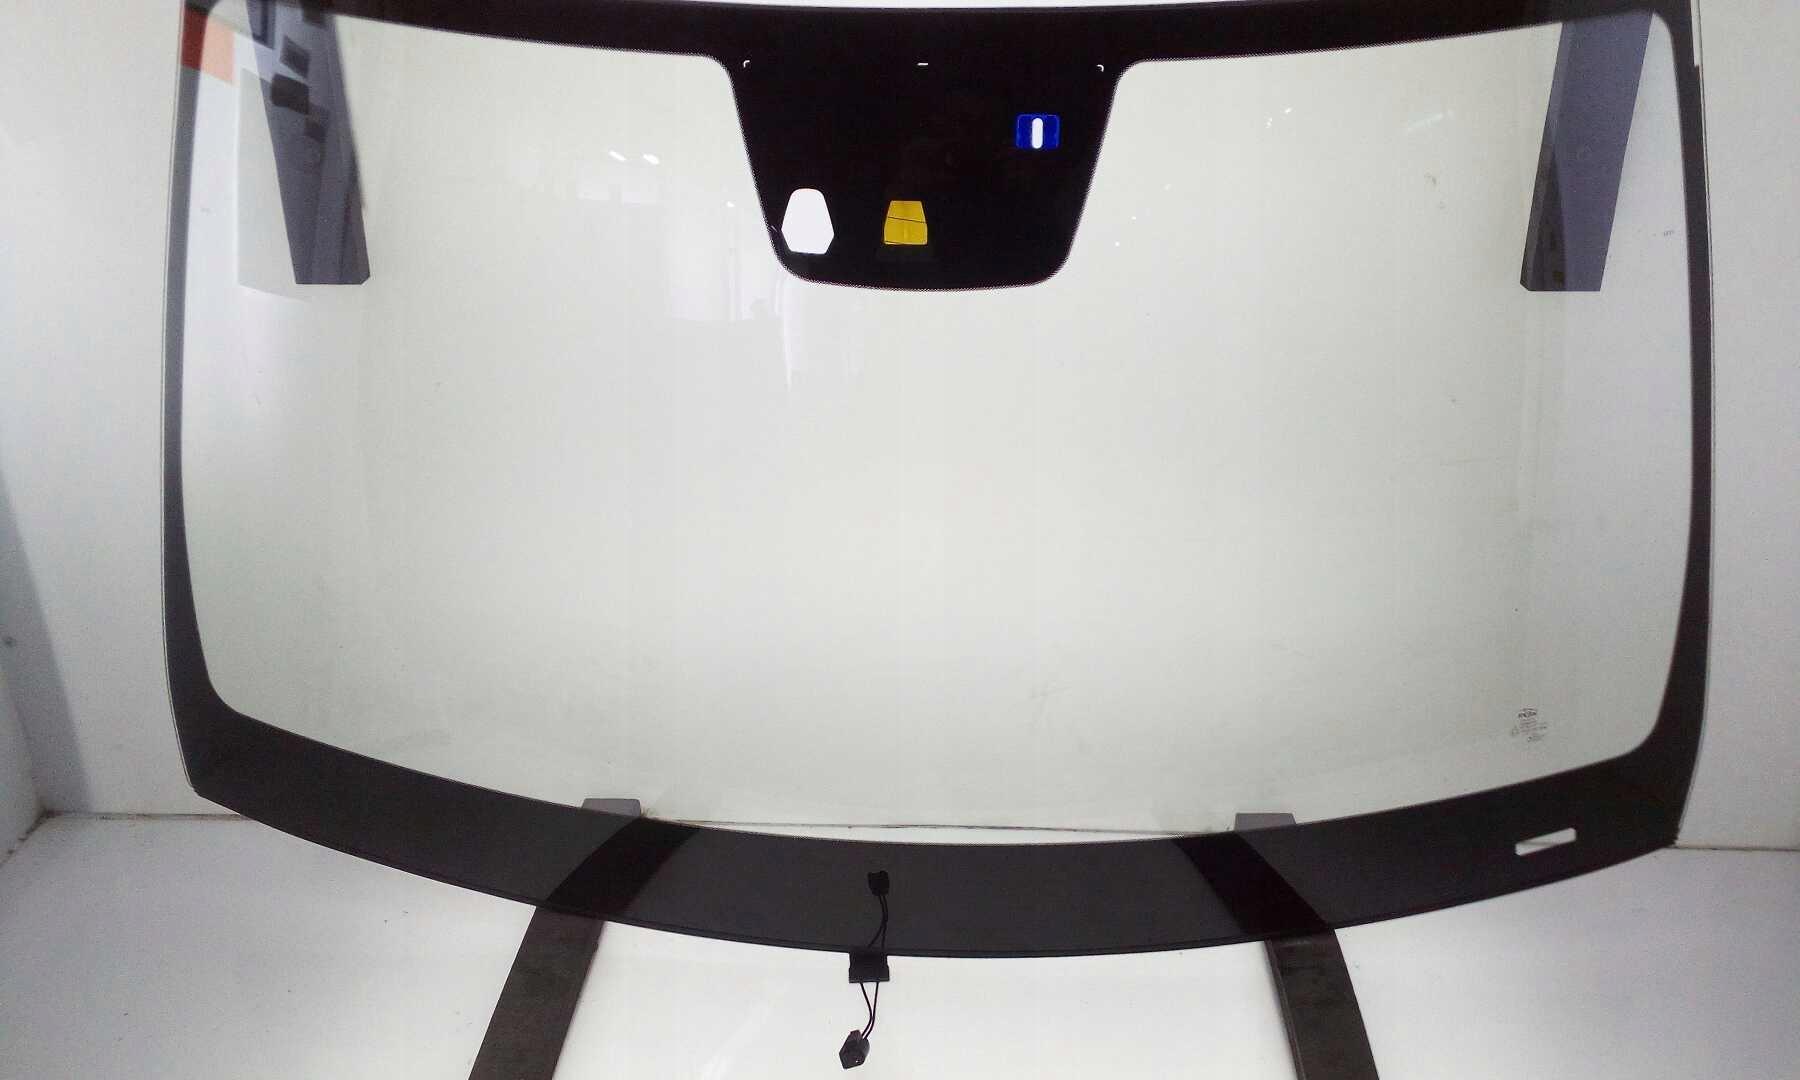 mercedes мл gl w166 11- сенсор камеры составляет solar